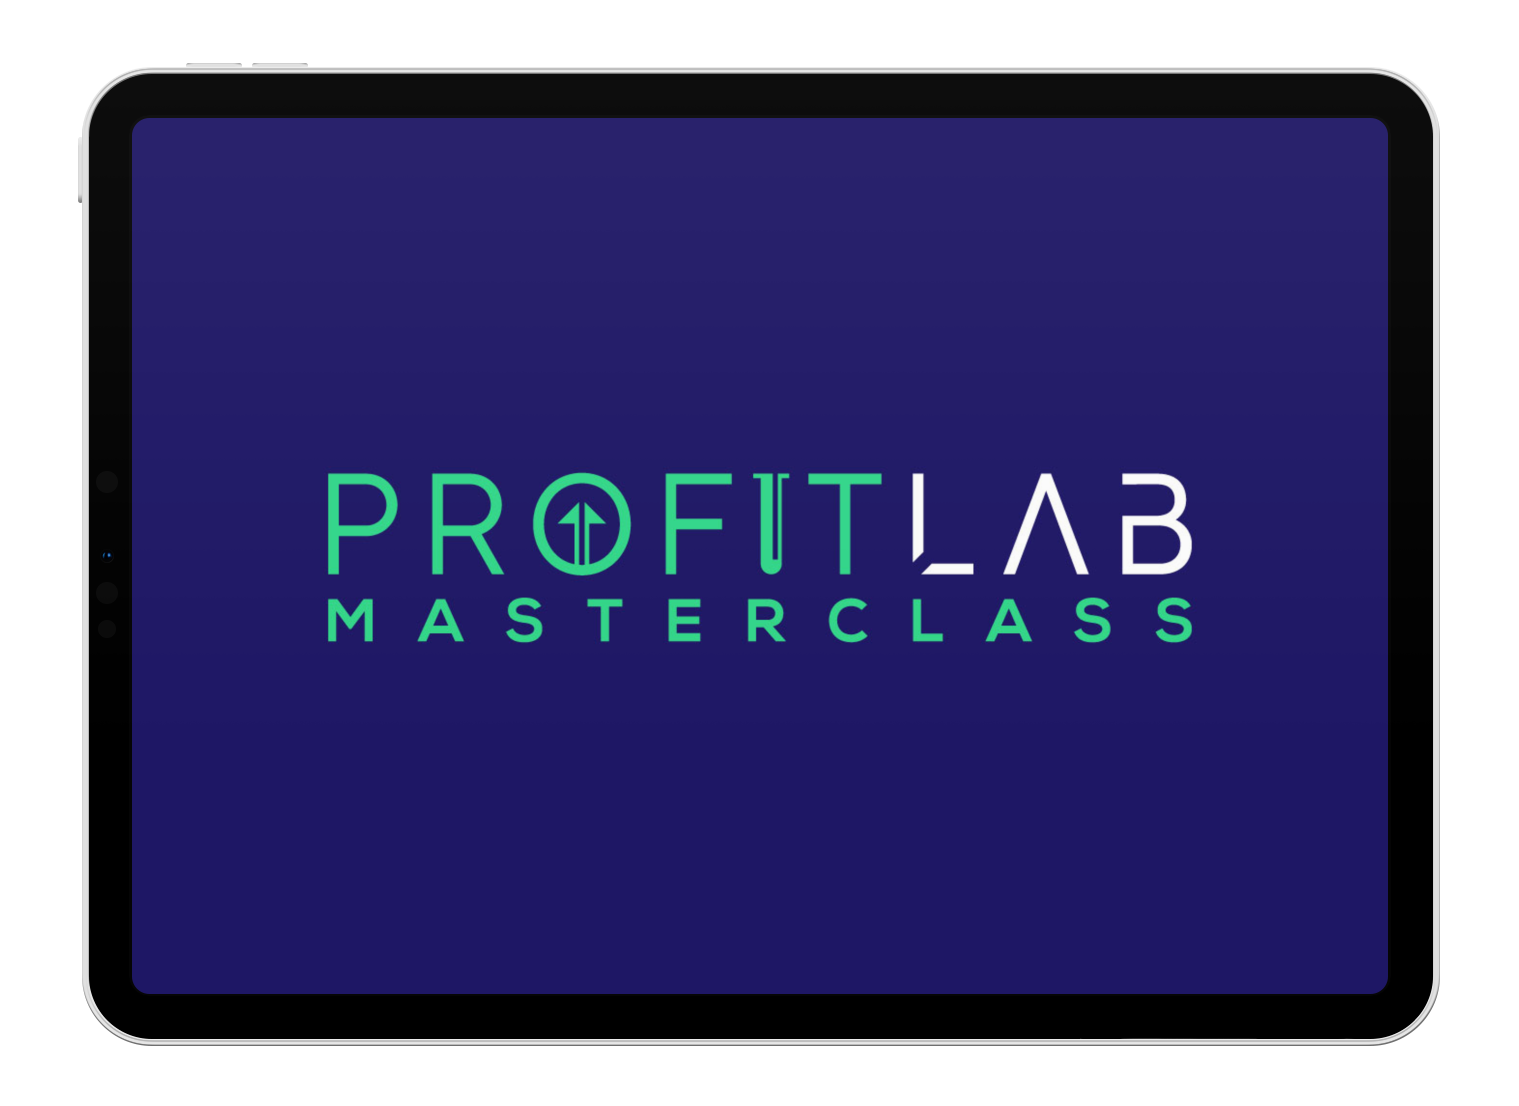 Profit Lab Masterclass